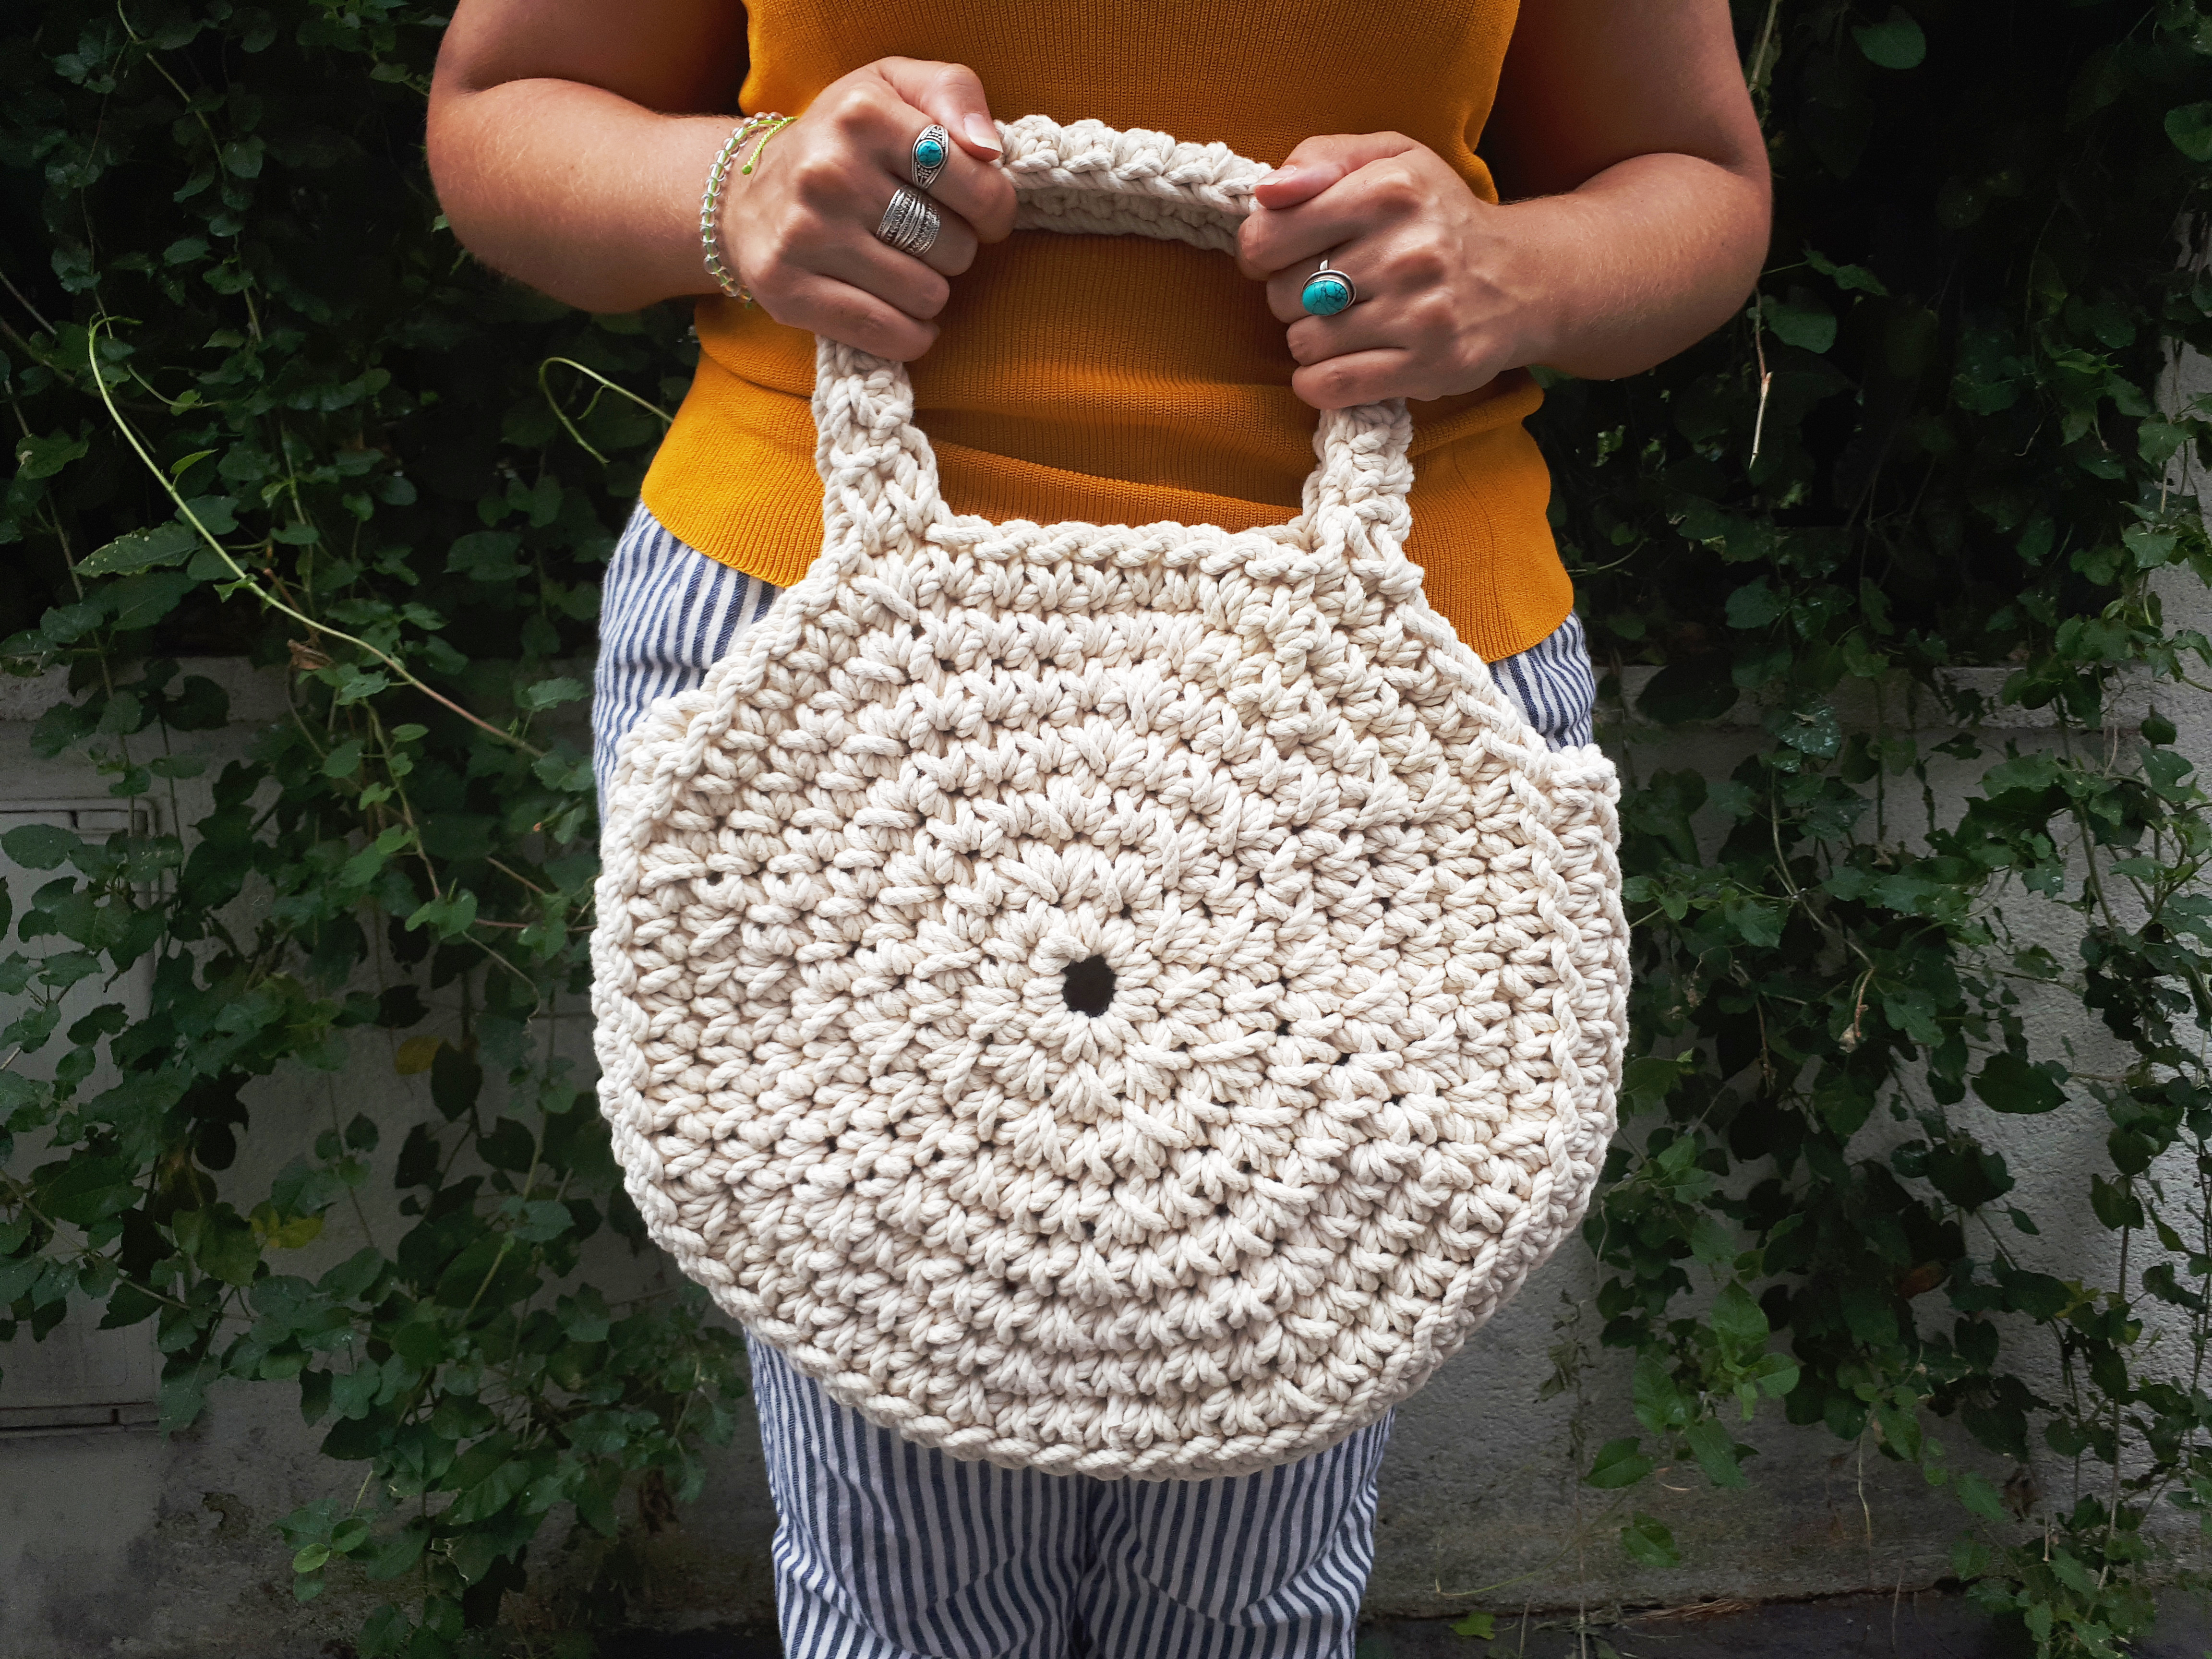 DIY-sac-crochet-corde-ete-Cactus-and-Style